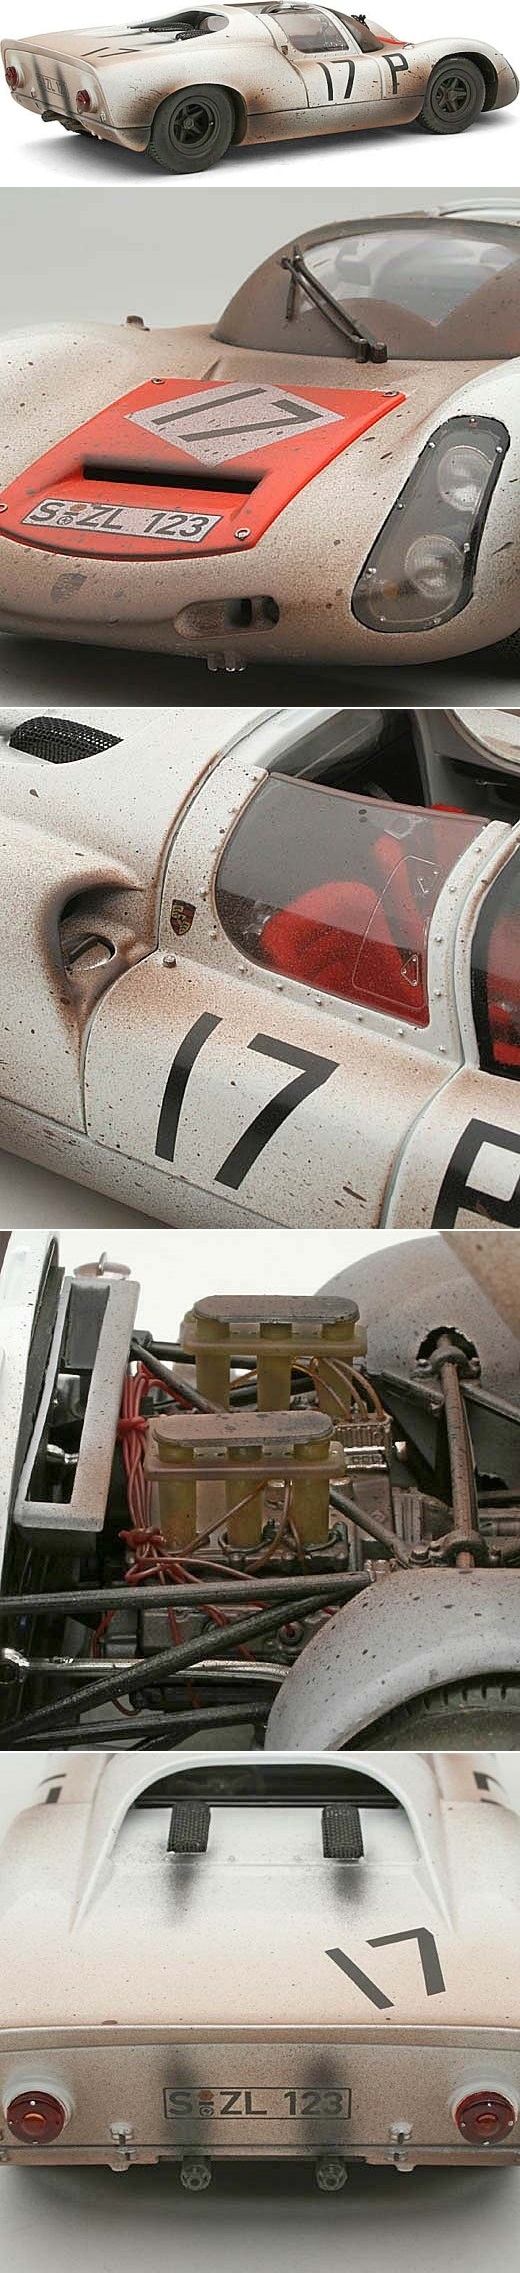 Exoto 1:18 1967 Porsche 910 #17- Schutz/Buzzetta- Nurburgring- Race Weathered- Ltd Ed of 67 http://www.diecast.org/diecast98/html/asp/list_reviews/xq/ASP/id.EX00066-FLP/qx/reviewpix.htm